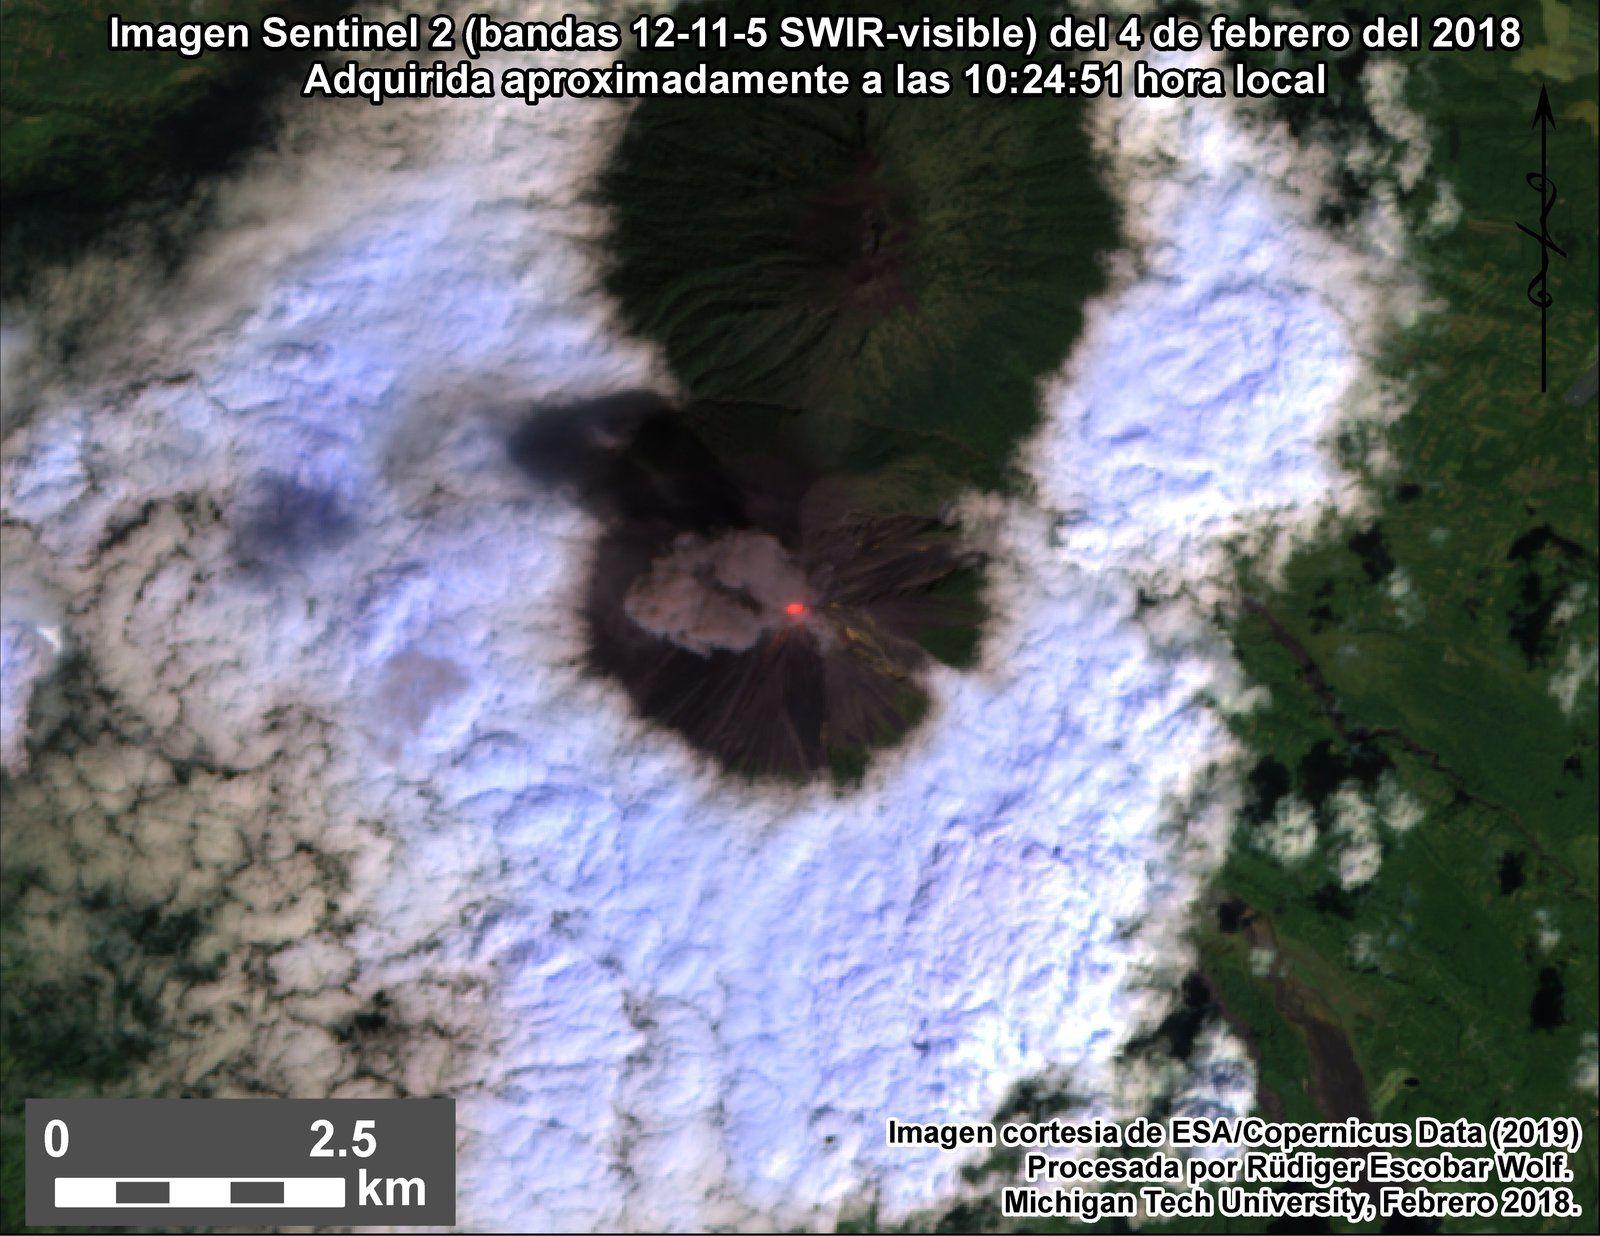 Fuego - image Sentinel 2 bands 12,11,5 SWIR-Visible du 04.02.2019 / 10h24 - via Rüdiger Escobar Wolf